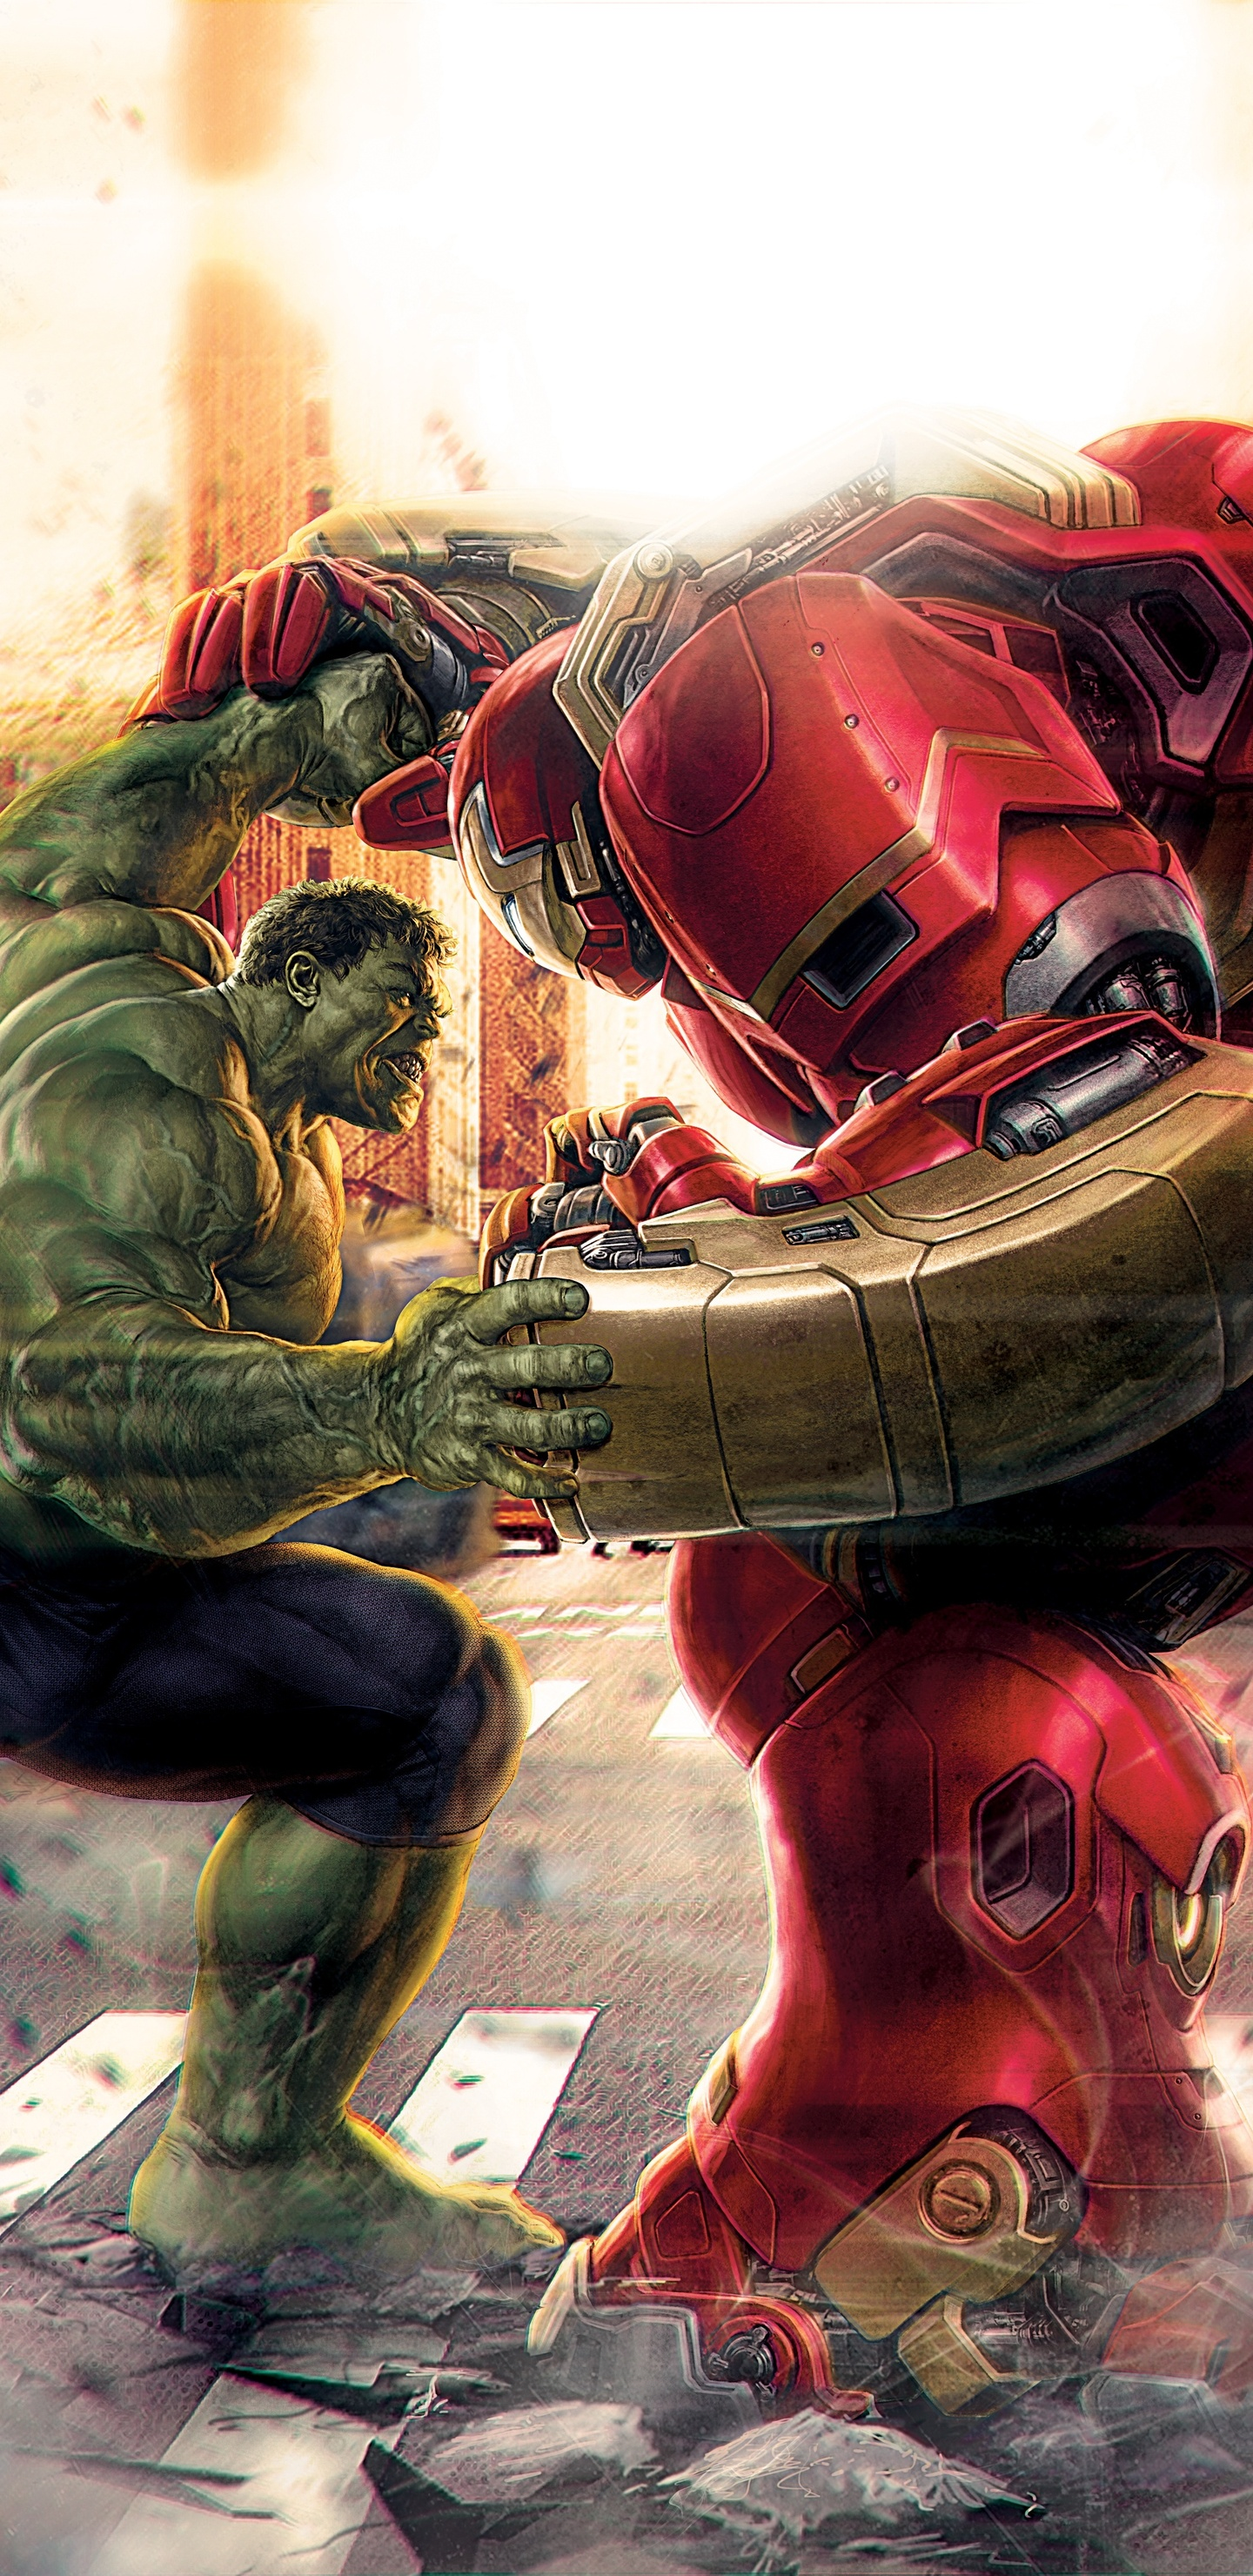 hulk-vs-iron-hulkbuster-artwork-kx.jpg